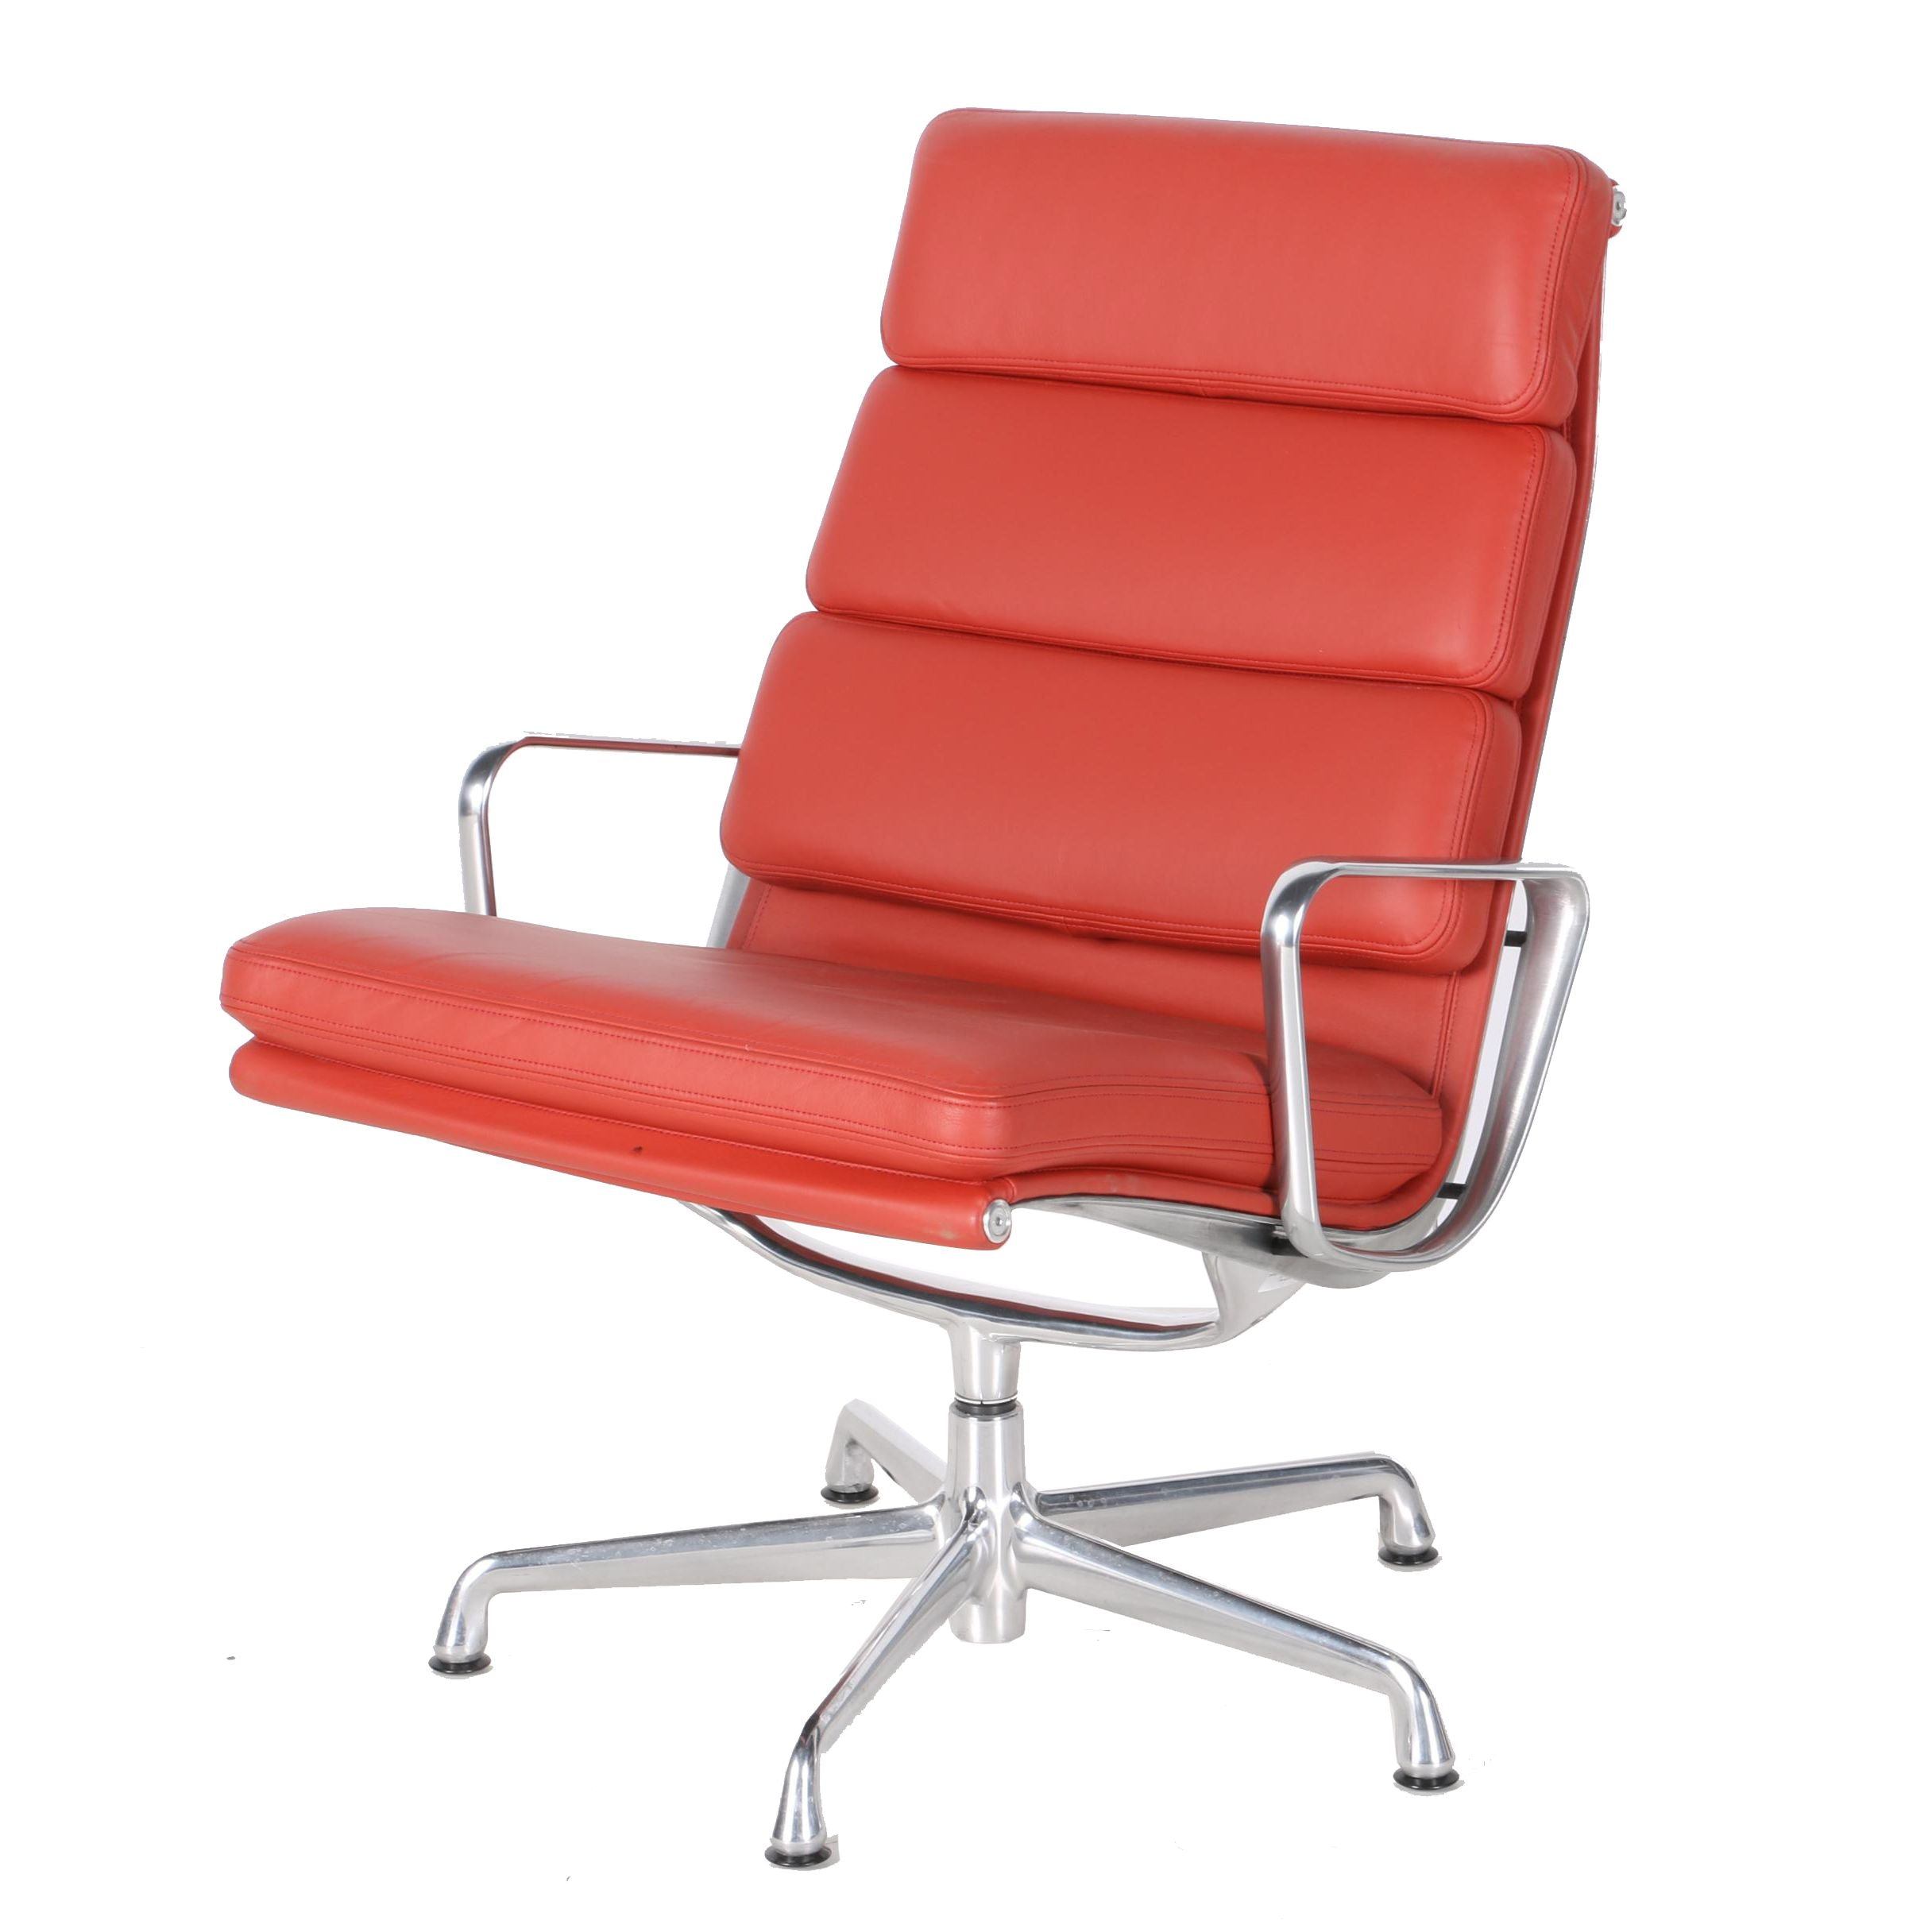 Herman Miller Eames Swivel Office Chair